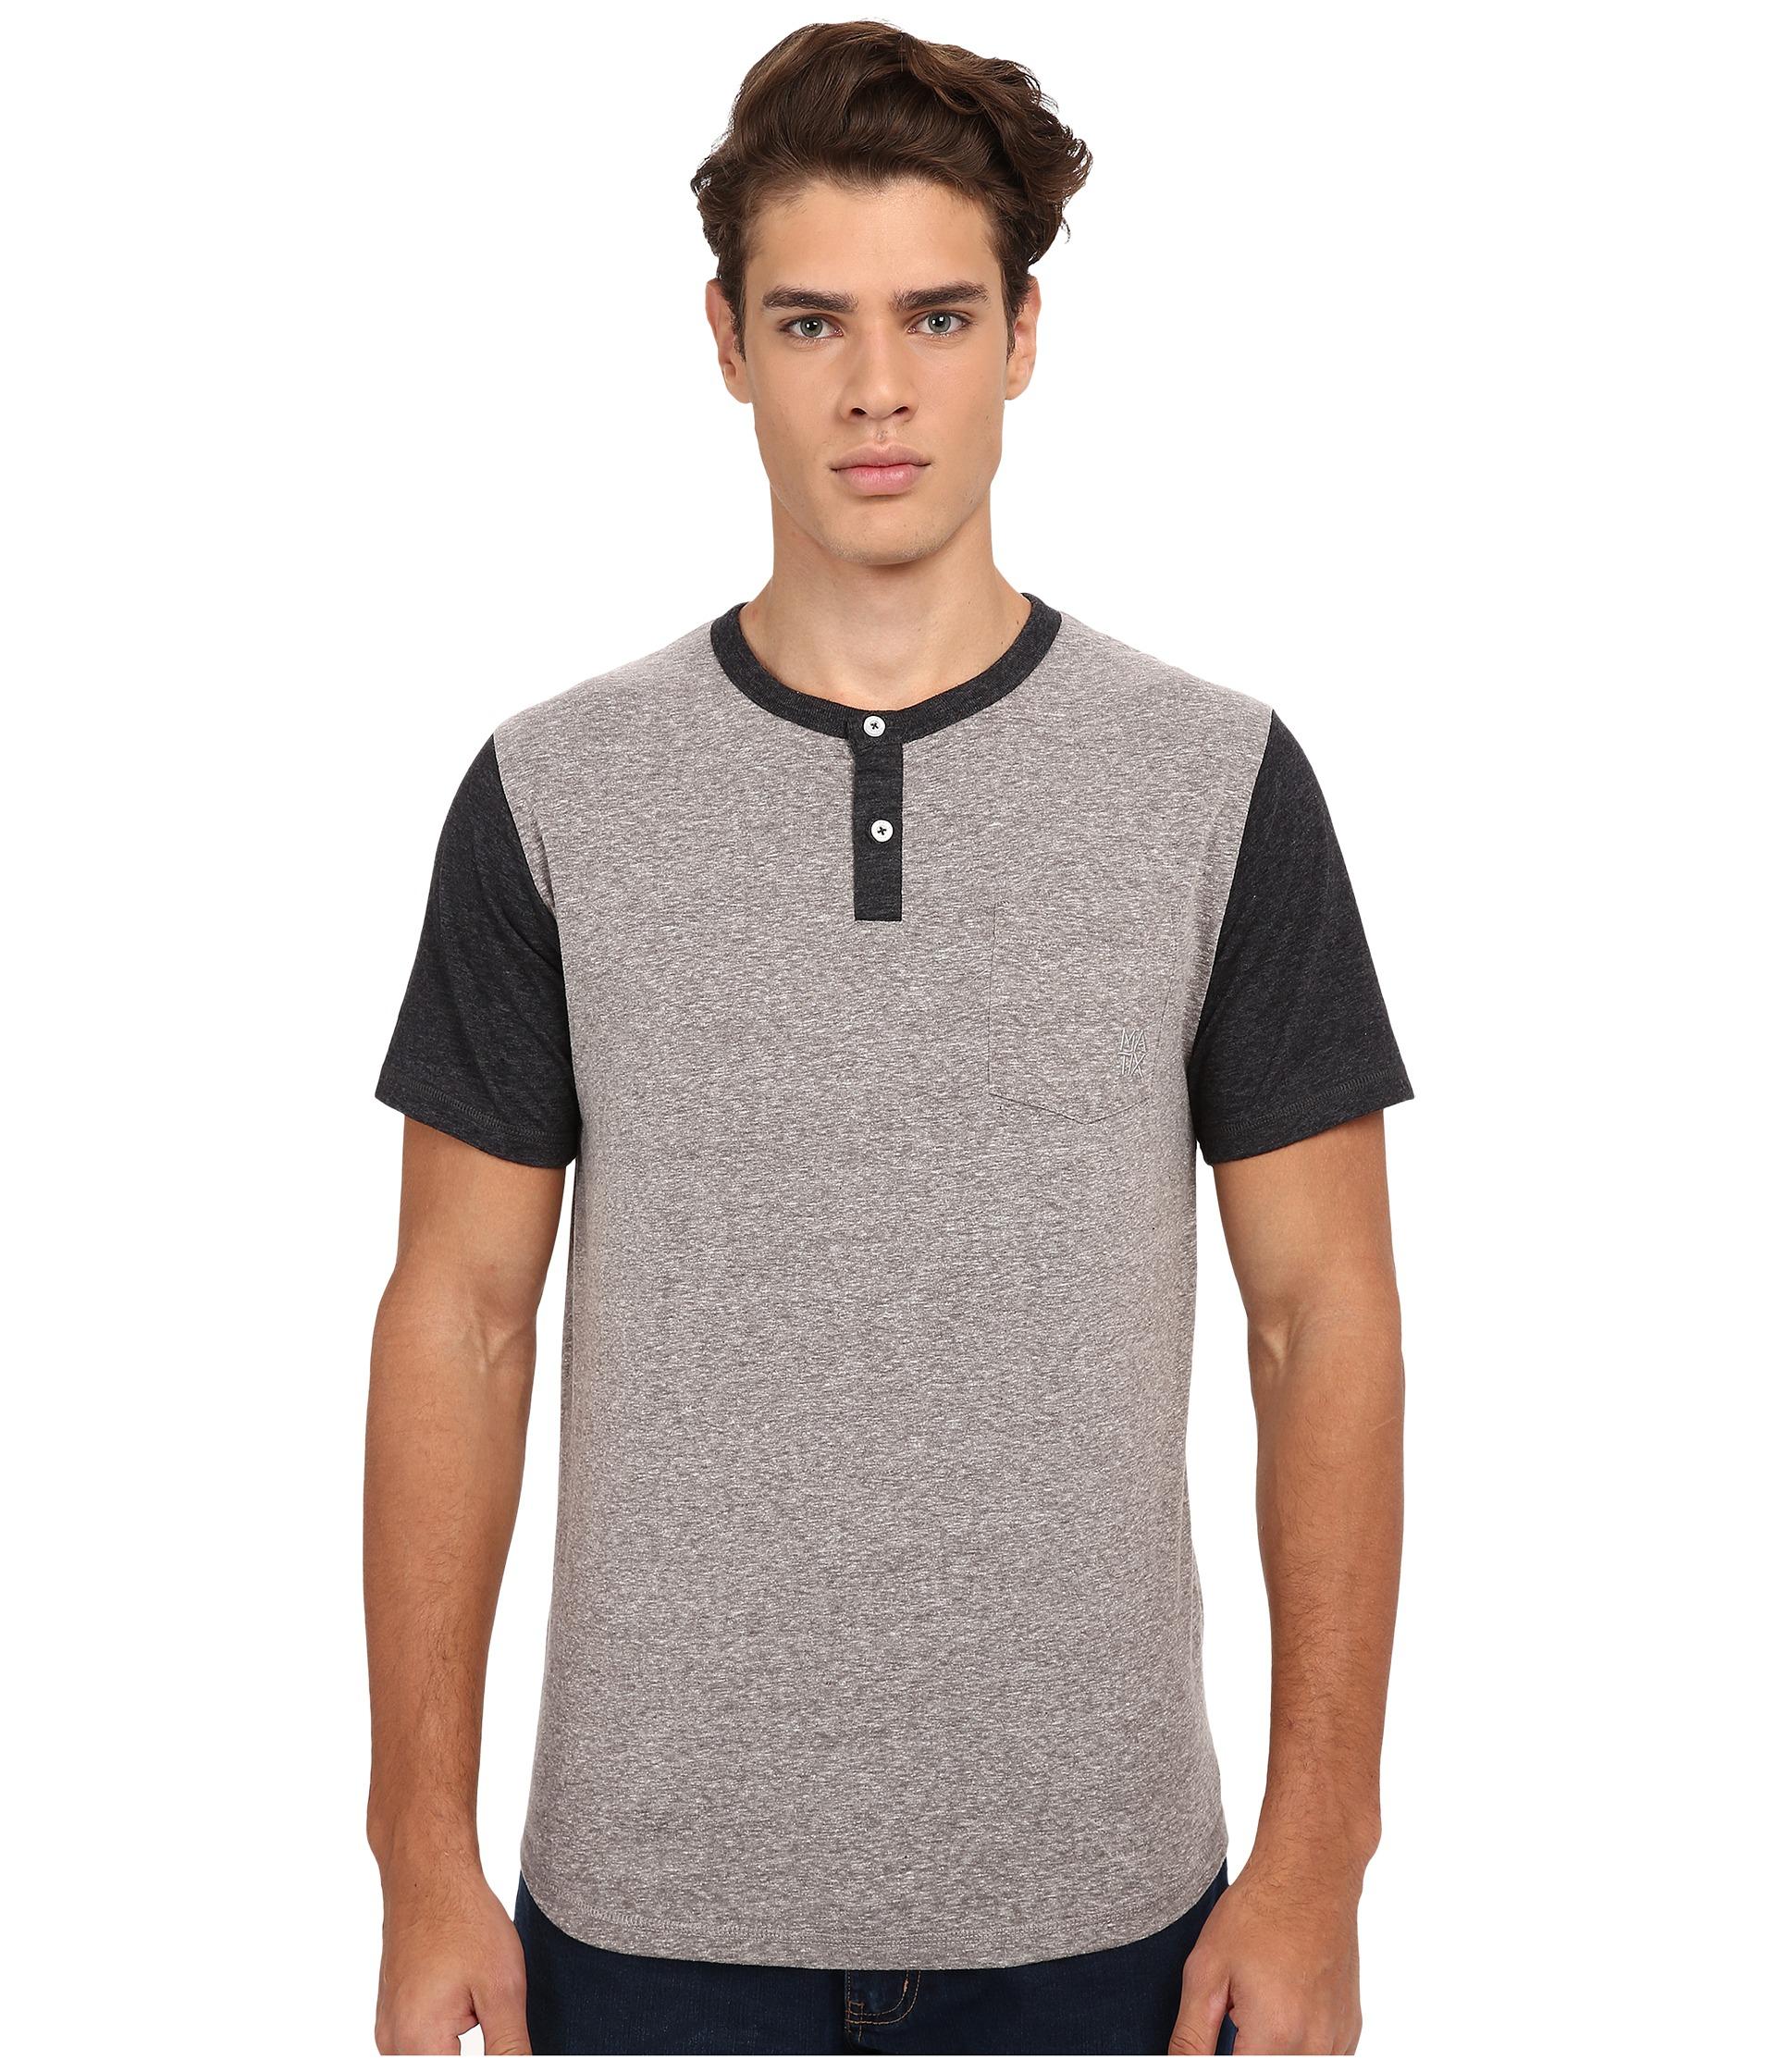 Lyst matix standard short sleeve baseball t shirt in for Short sleeve t shirts with longer sleeves